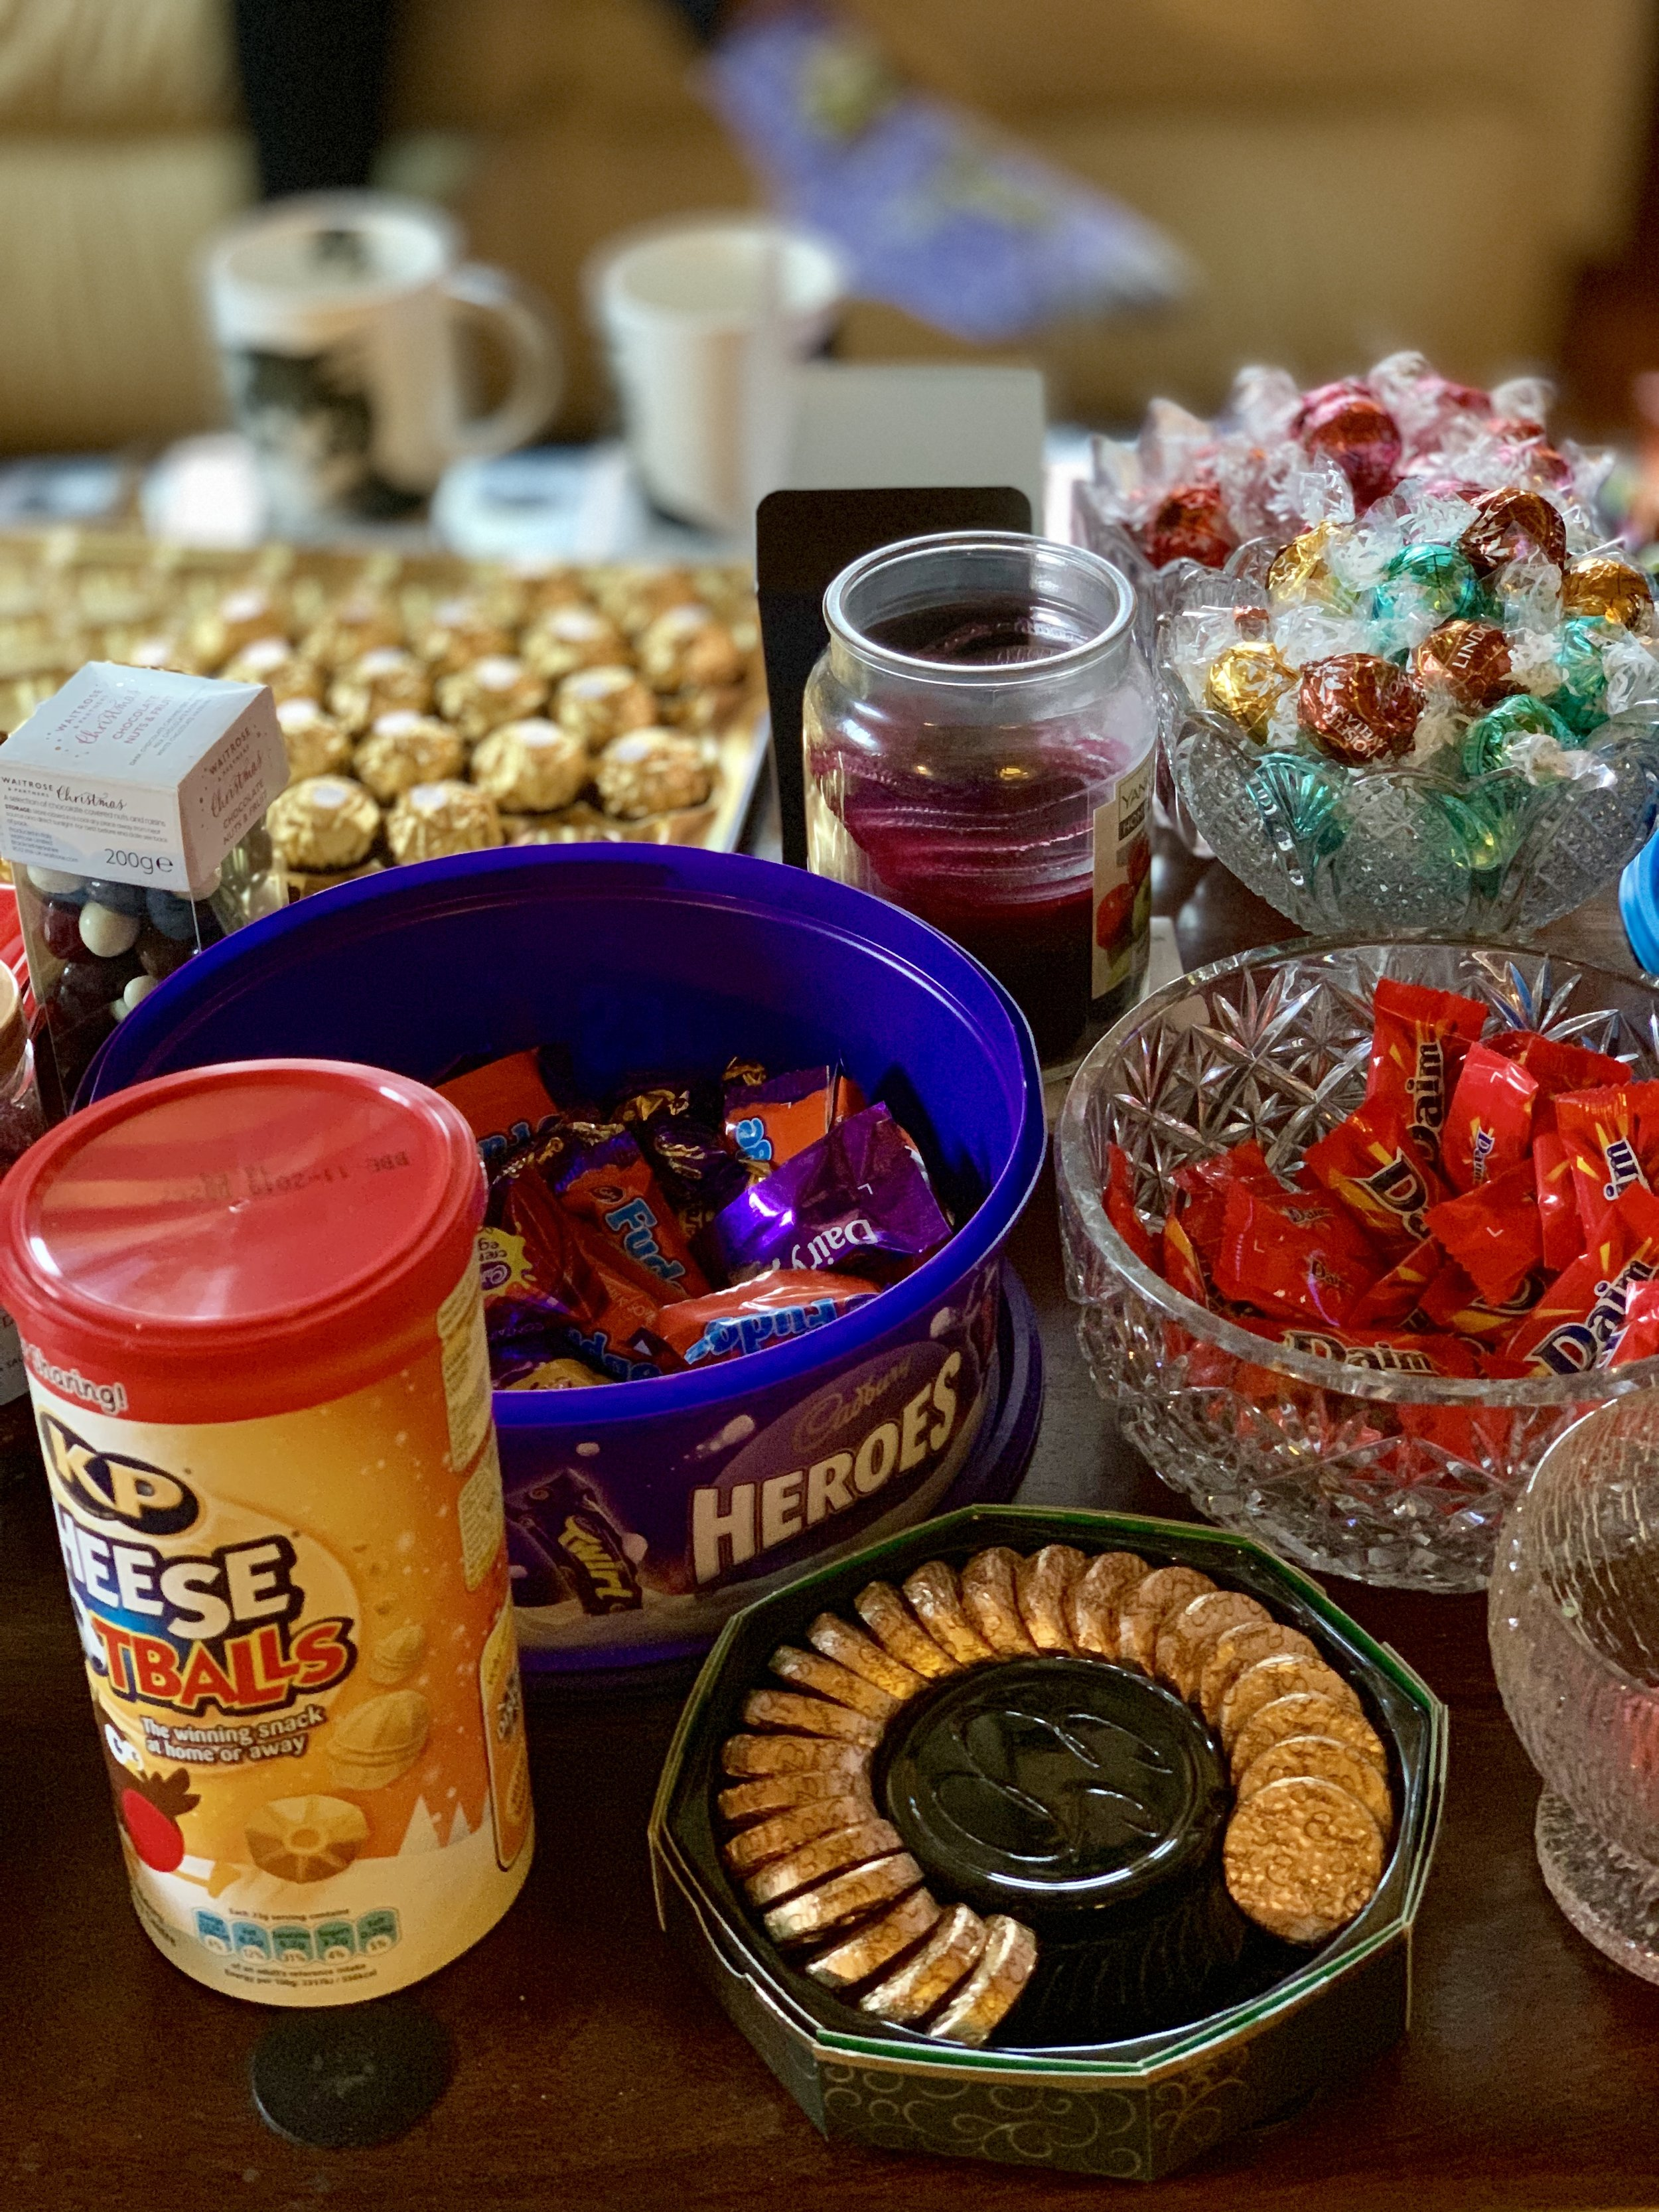 Christmas Carnivore Diet Break Carbohydrate binge Christmas Treats Chocolate Sweets